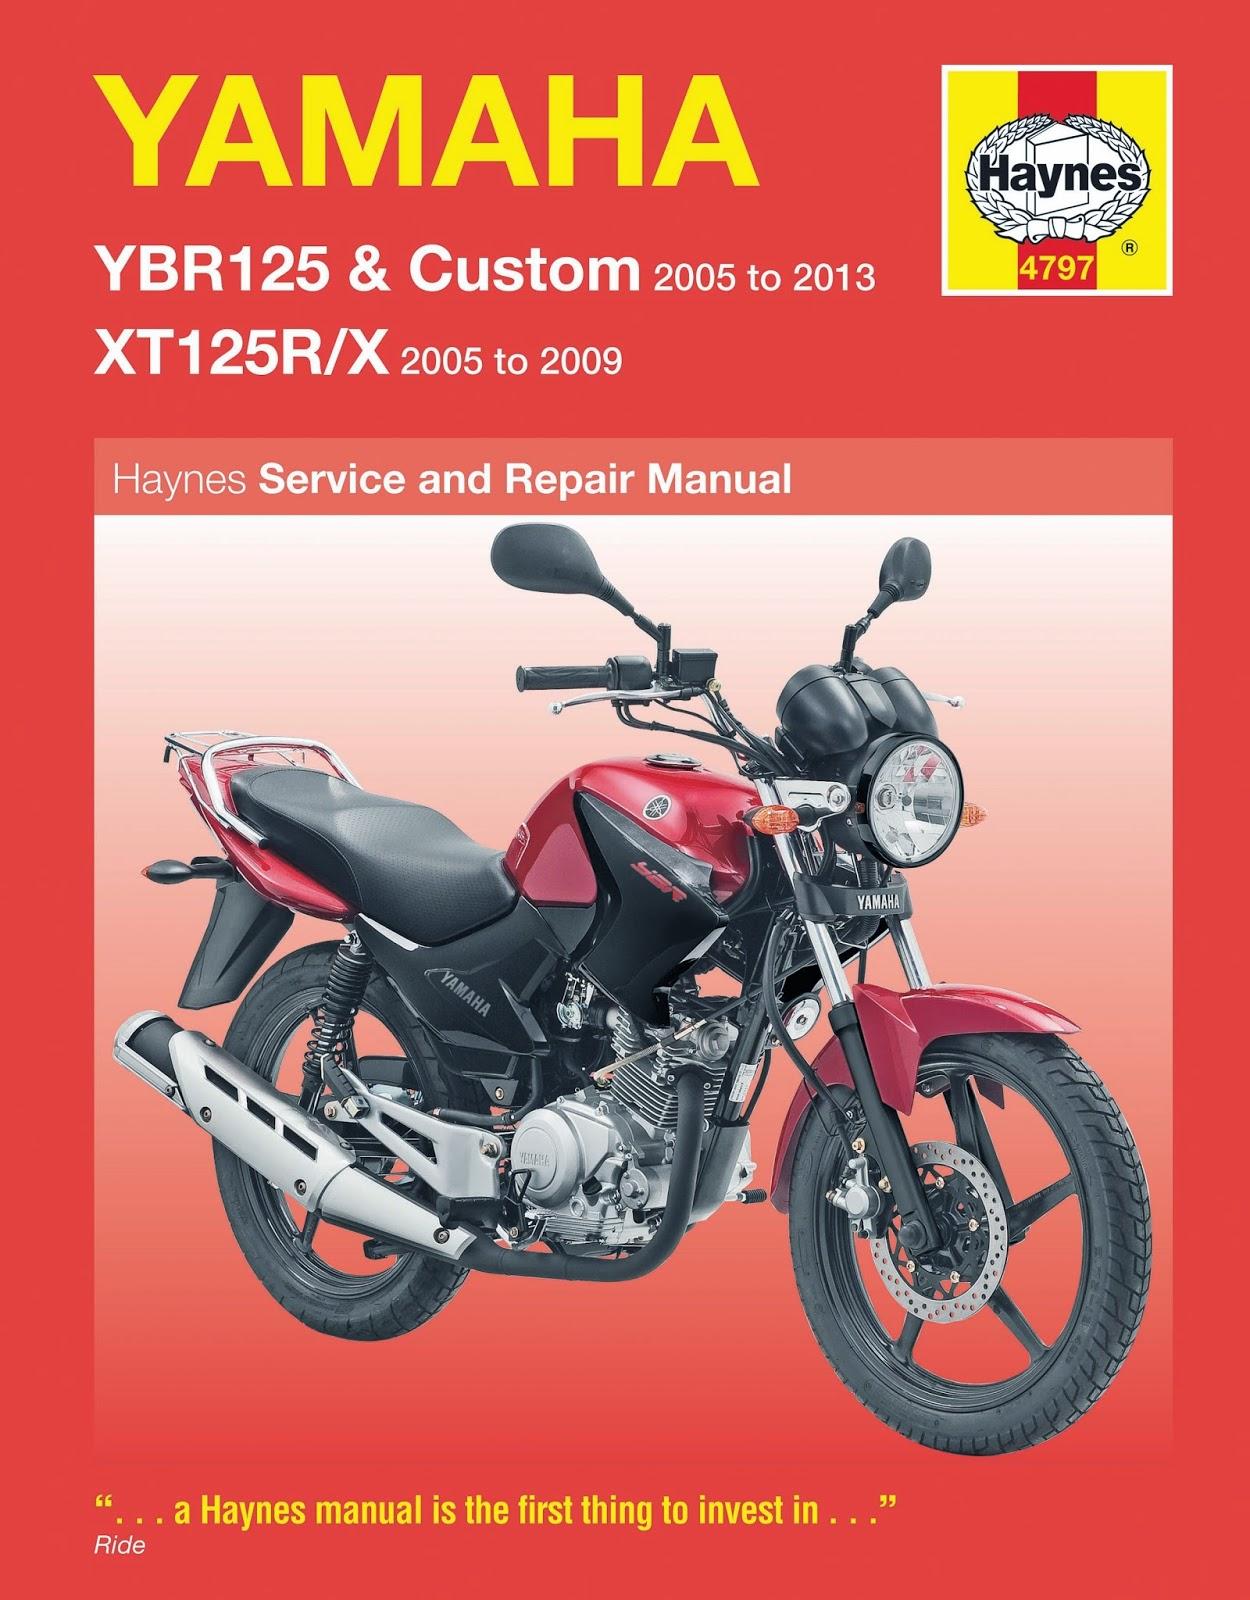 Yamaha YBR 125 Owner Blog : Yamaha YBR 125 Engine Rebuild